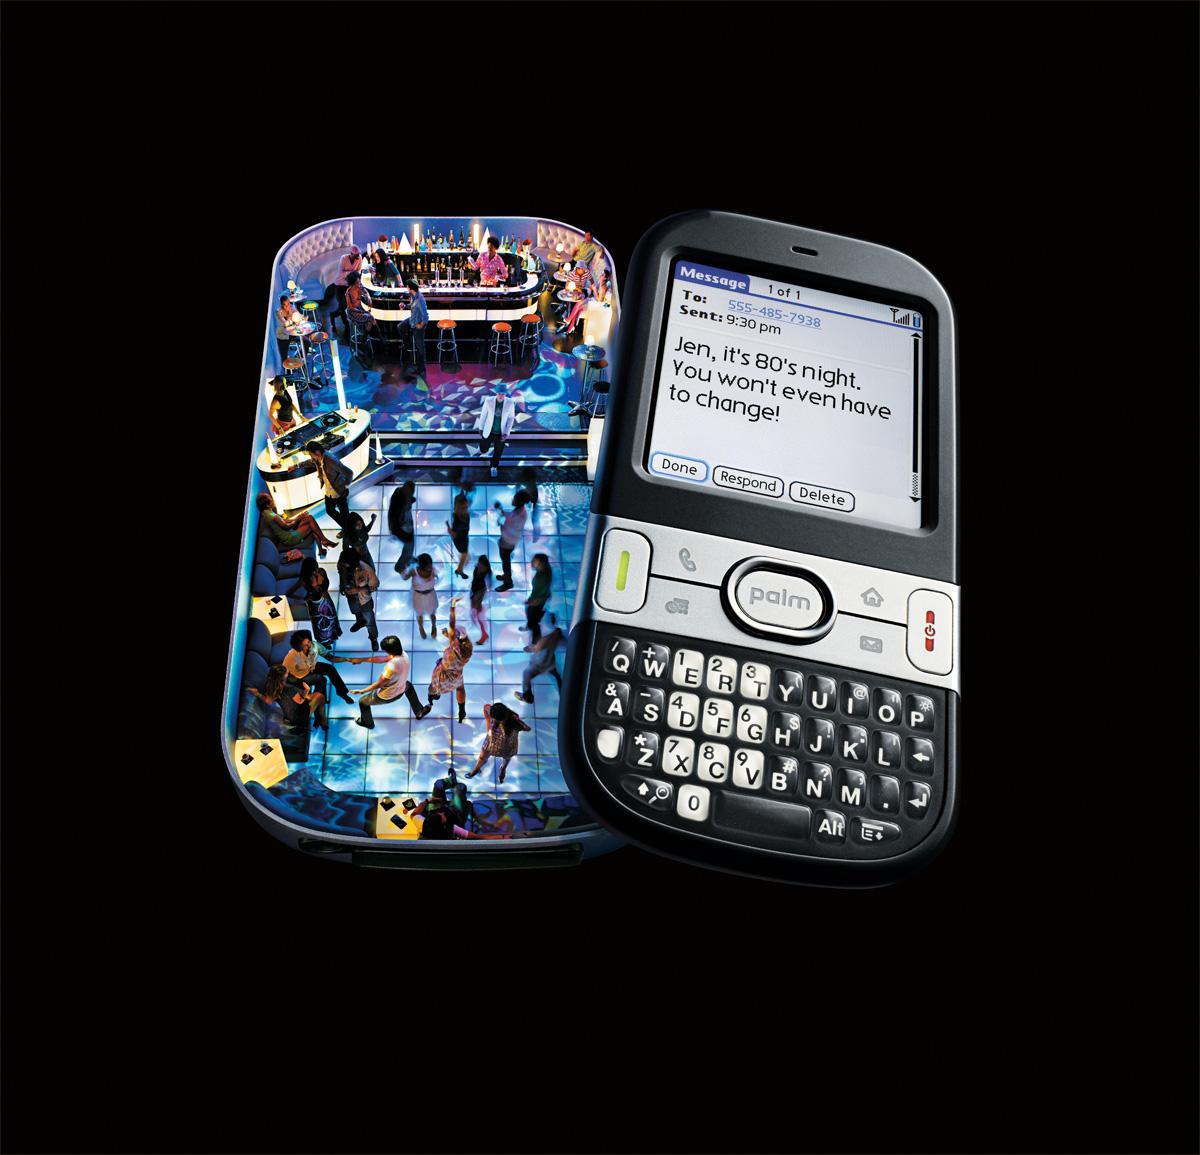 Palm Pilot Print Ad -  80's night